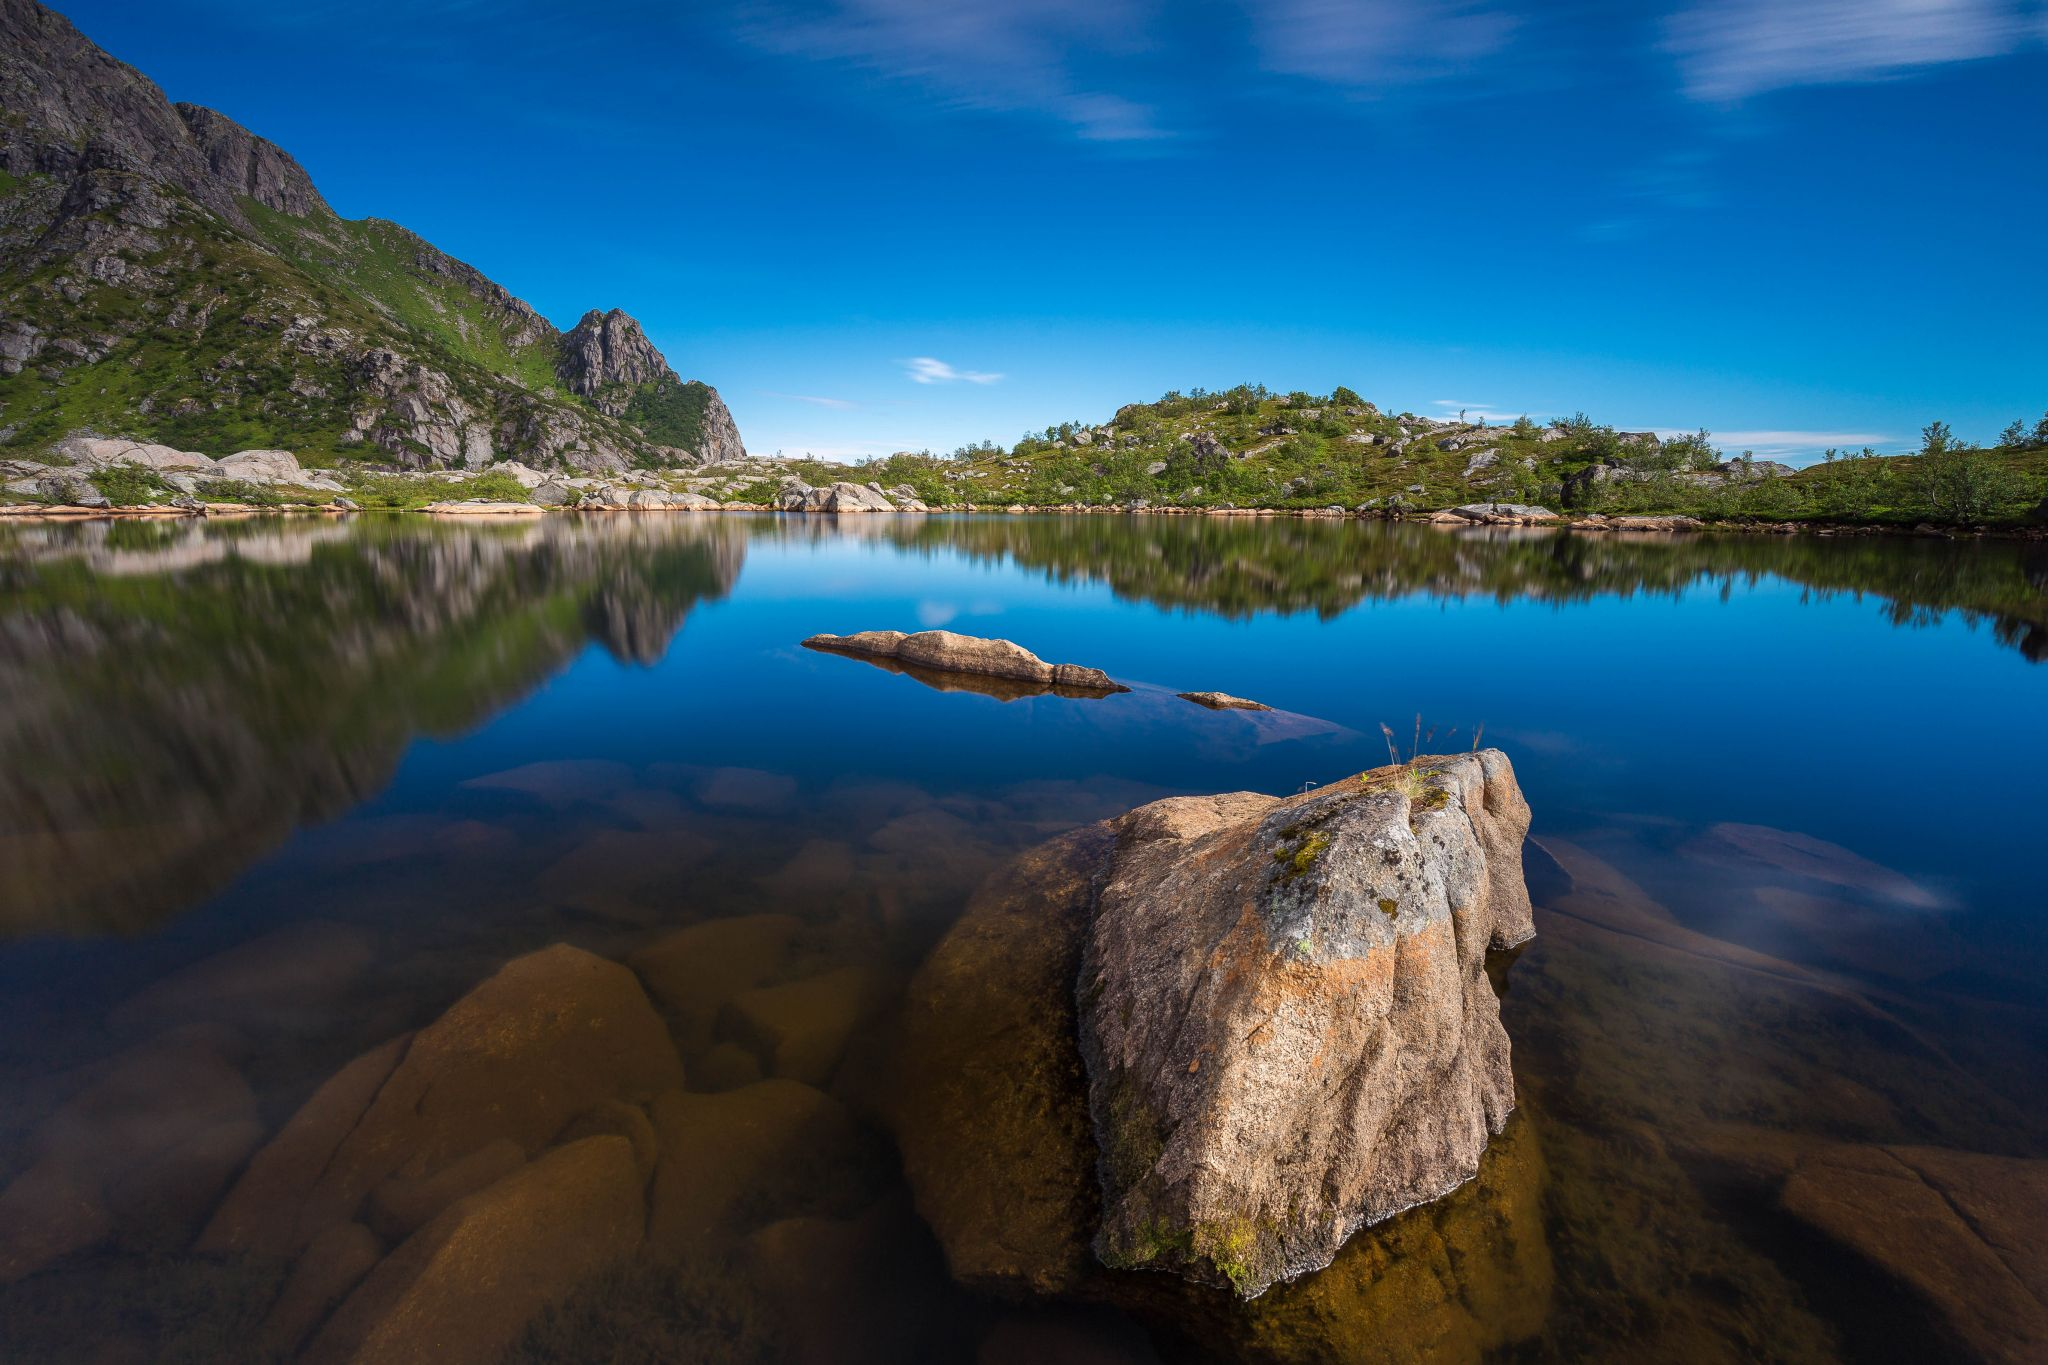 Heiavatnet, Norway